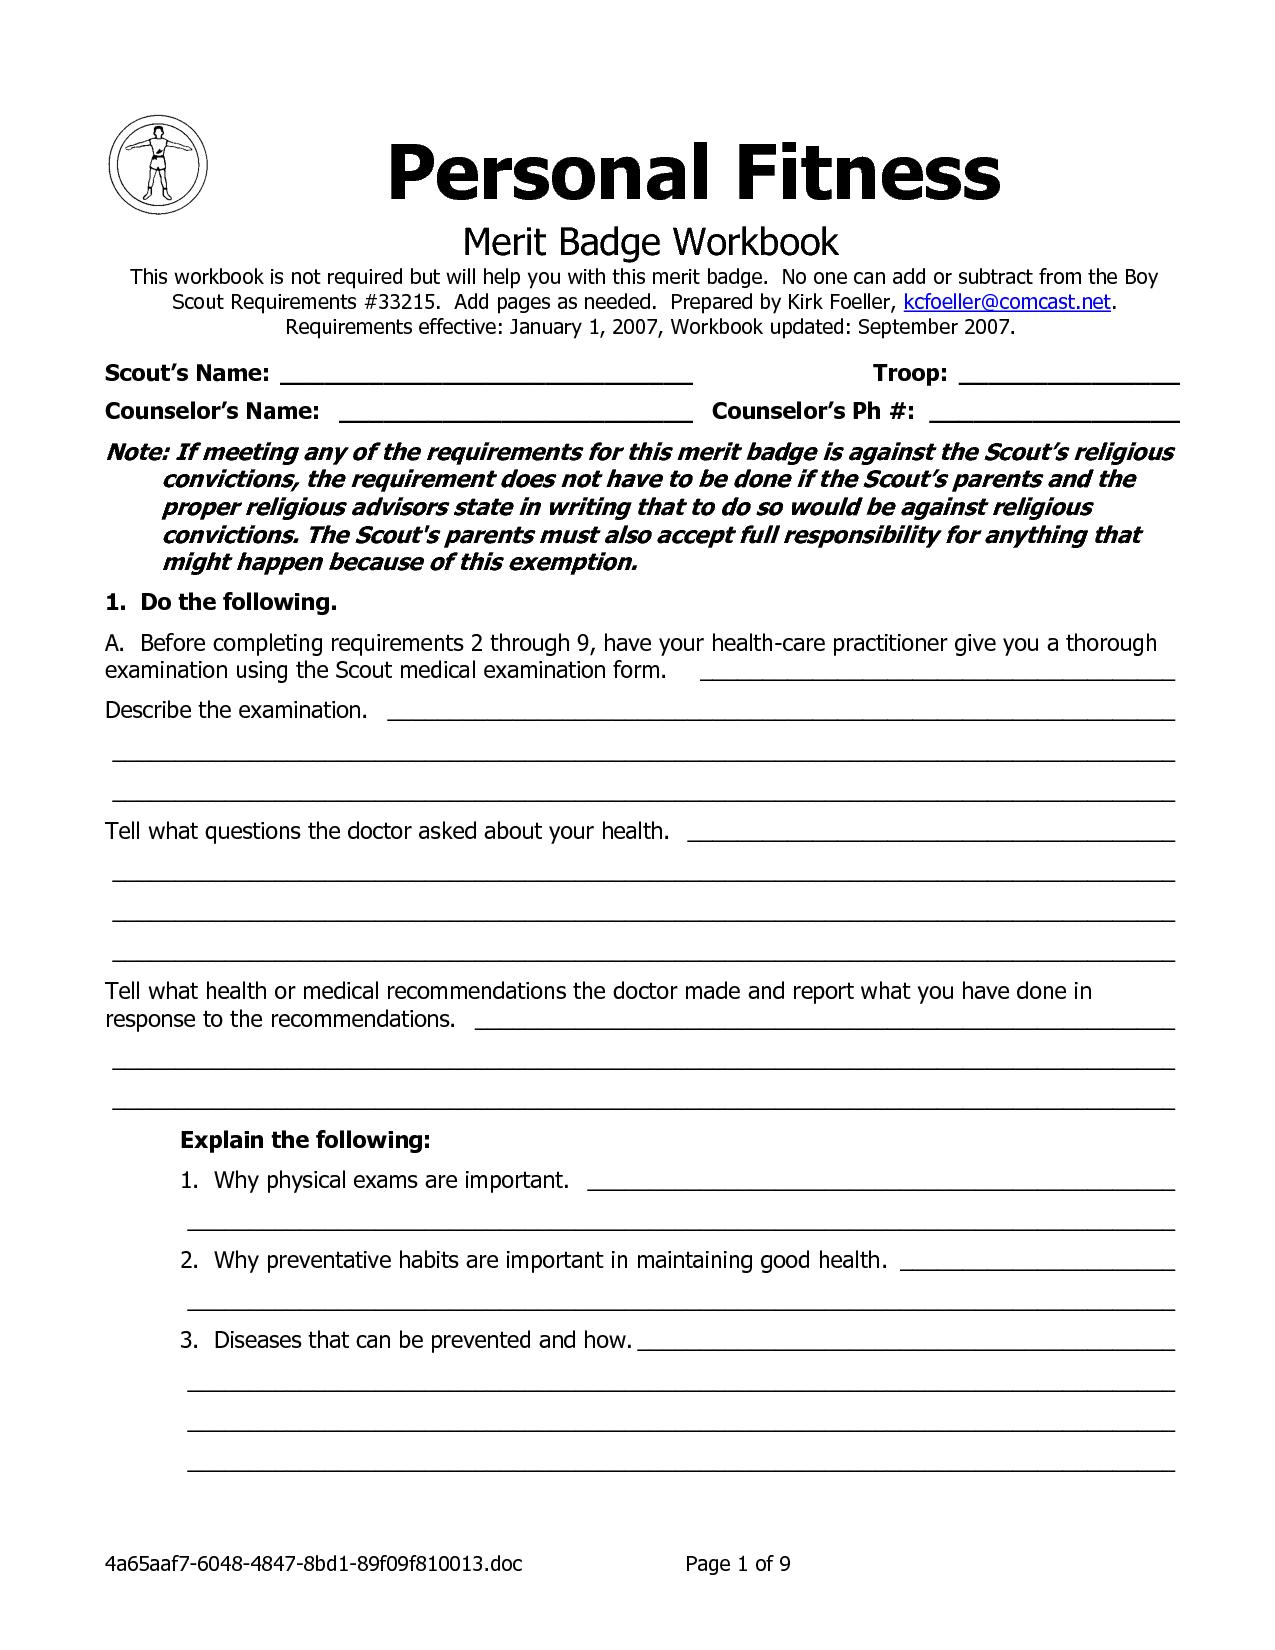 Personal Fitness Merit Badge Worksheet Answers